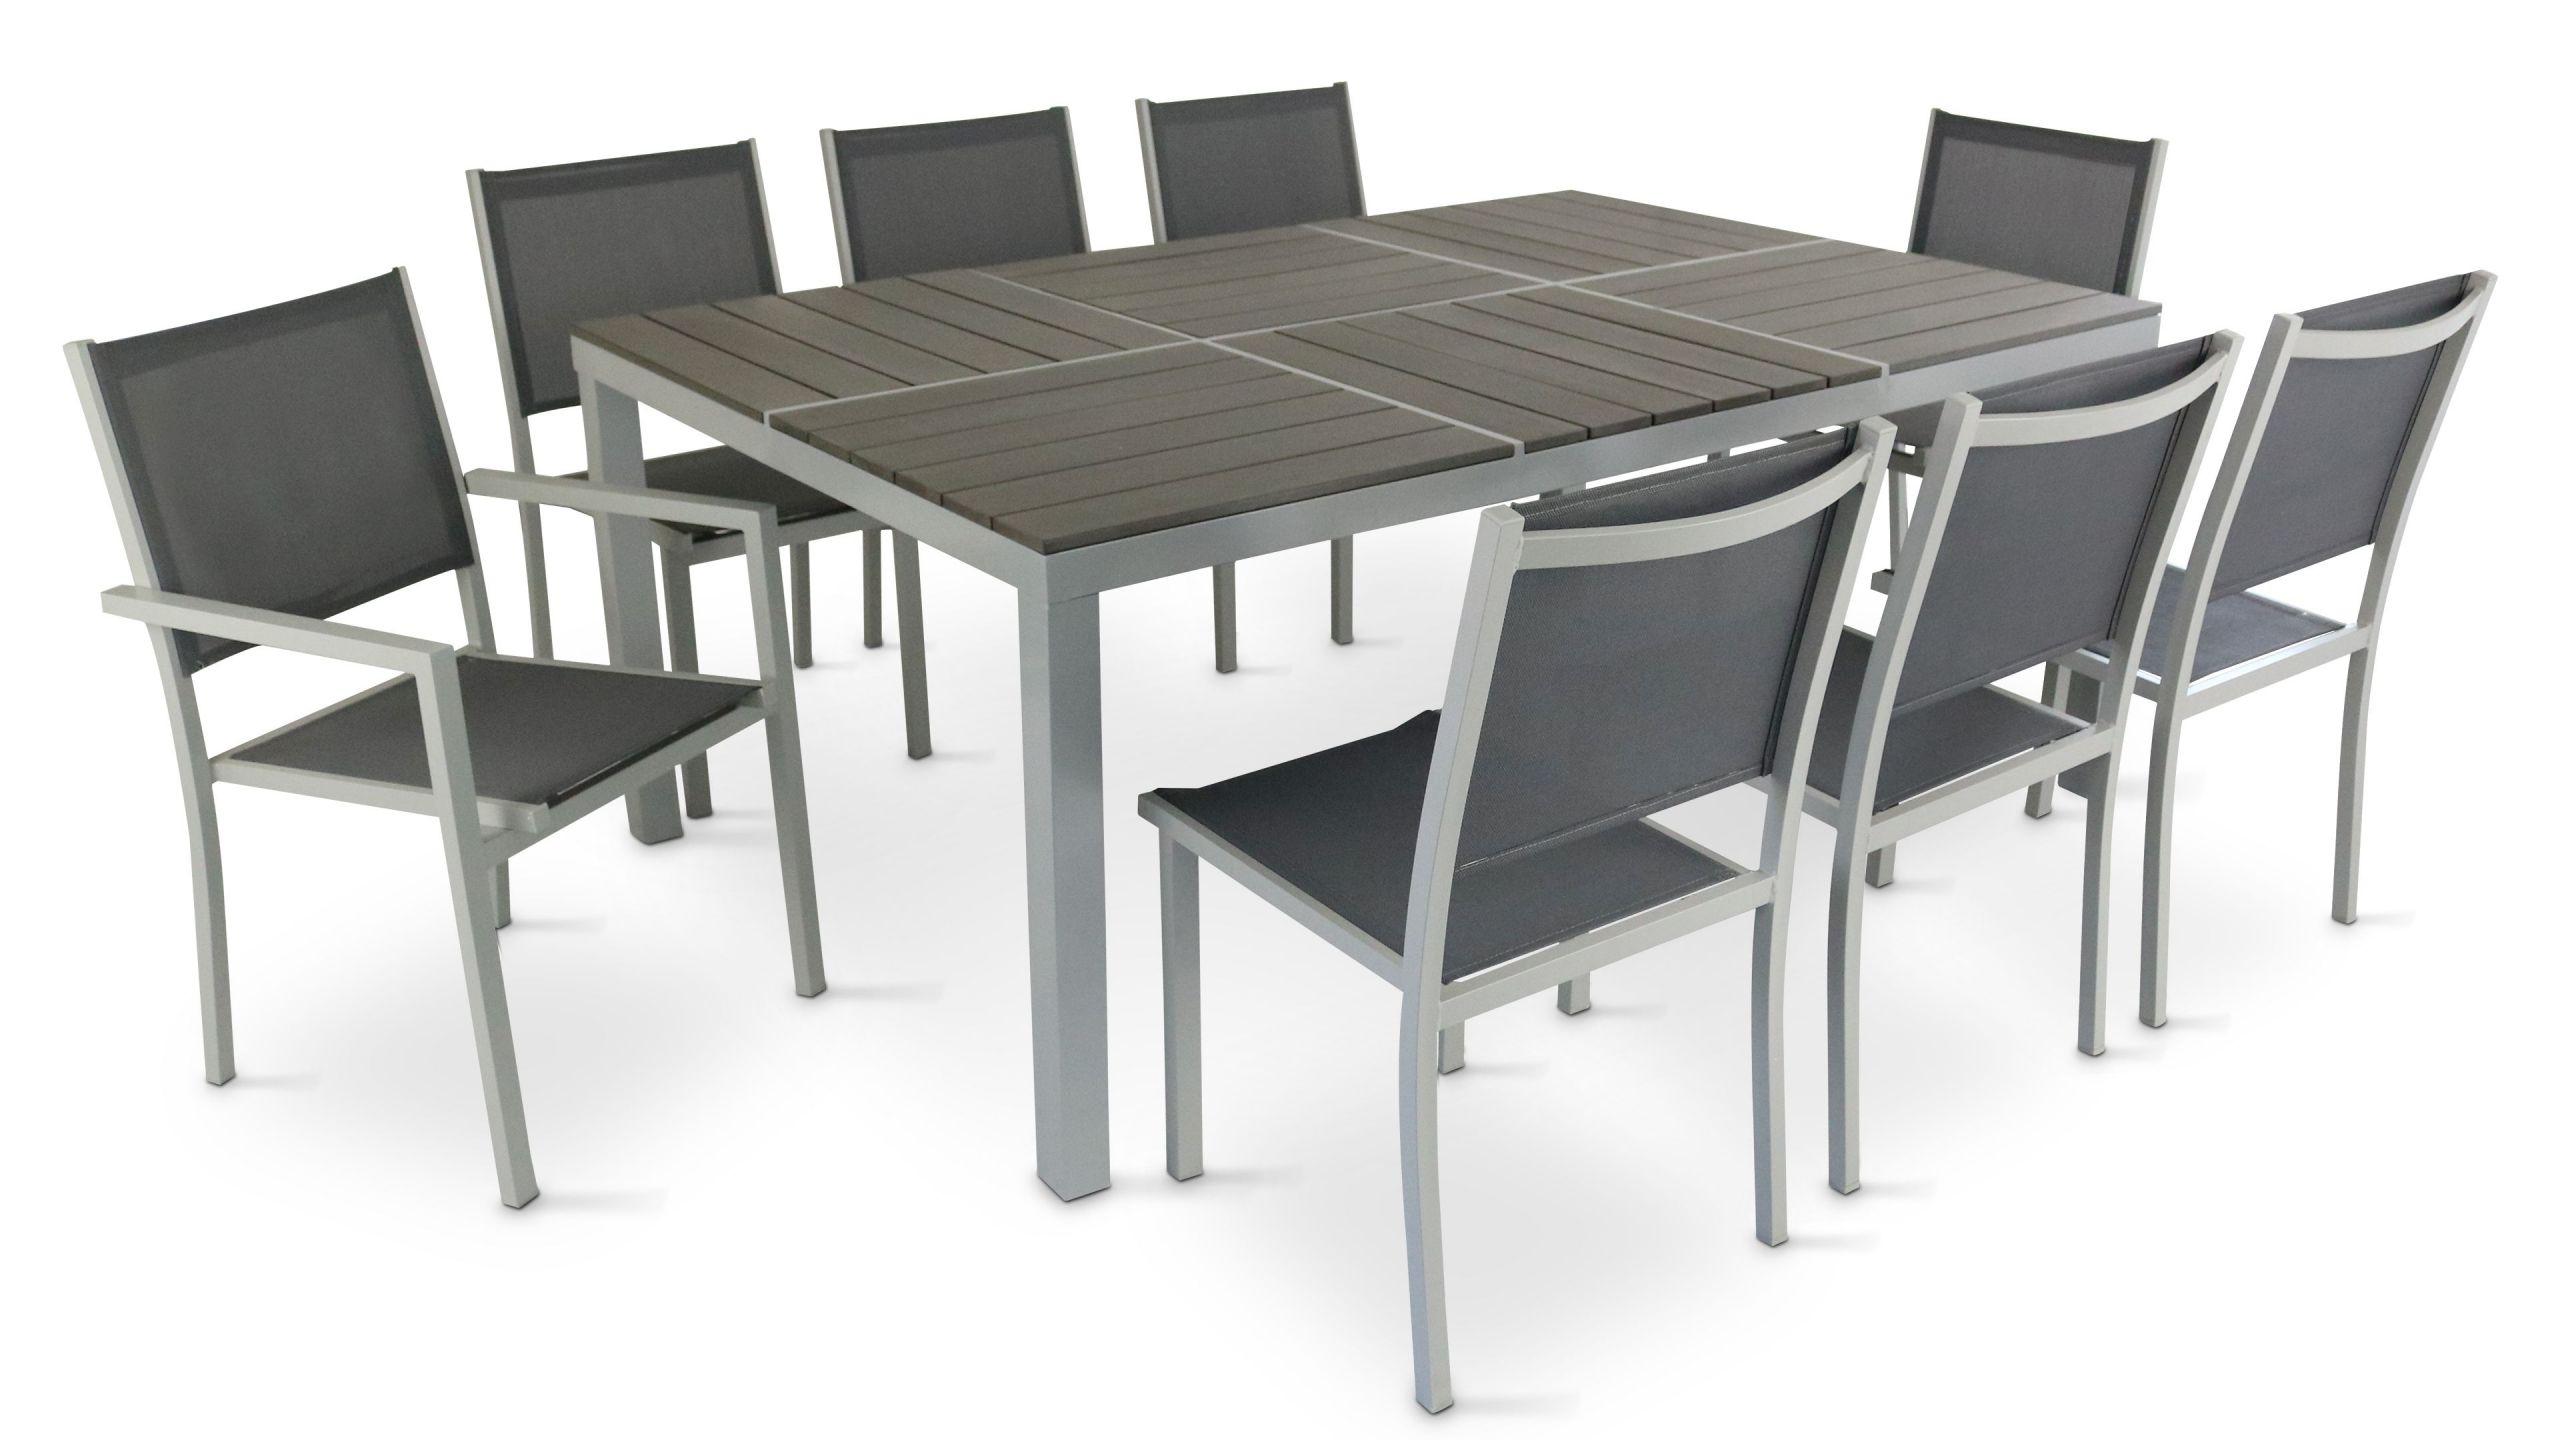 Table De Jardin En Aluminium Schème - Idees Conception Jardin pour Table De Jardin Carrée 8 Personnes